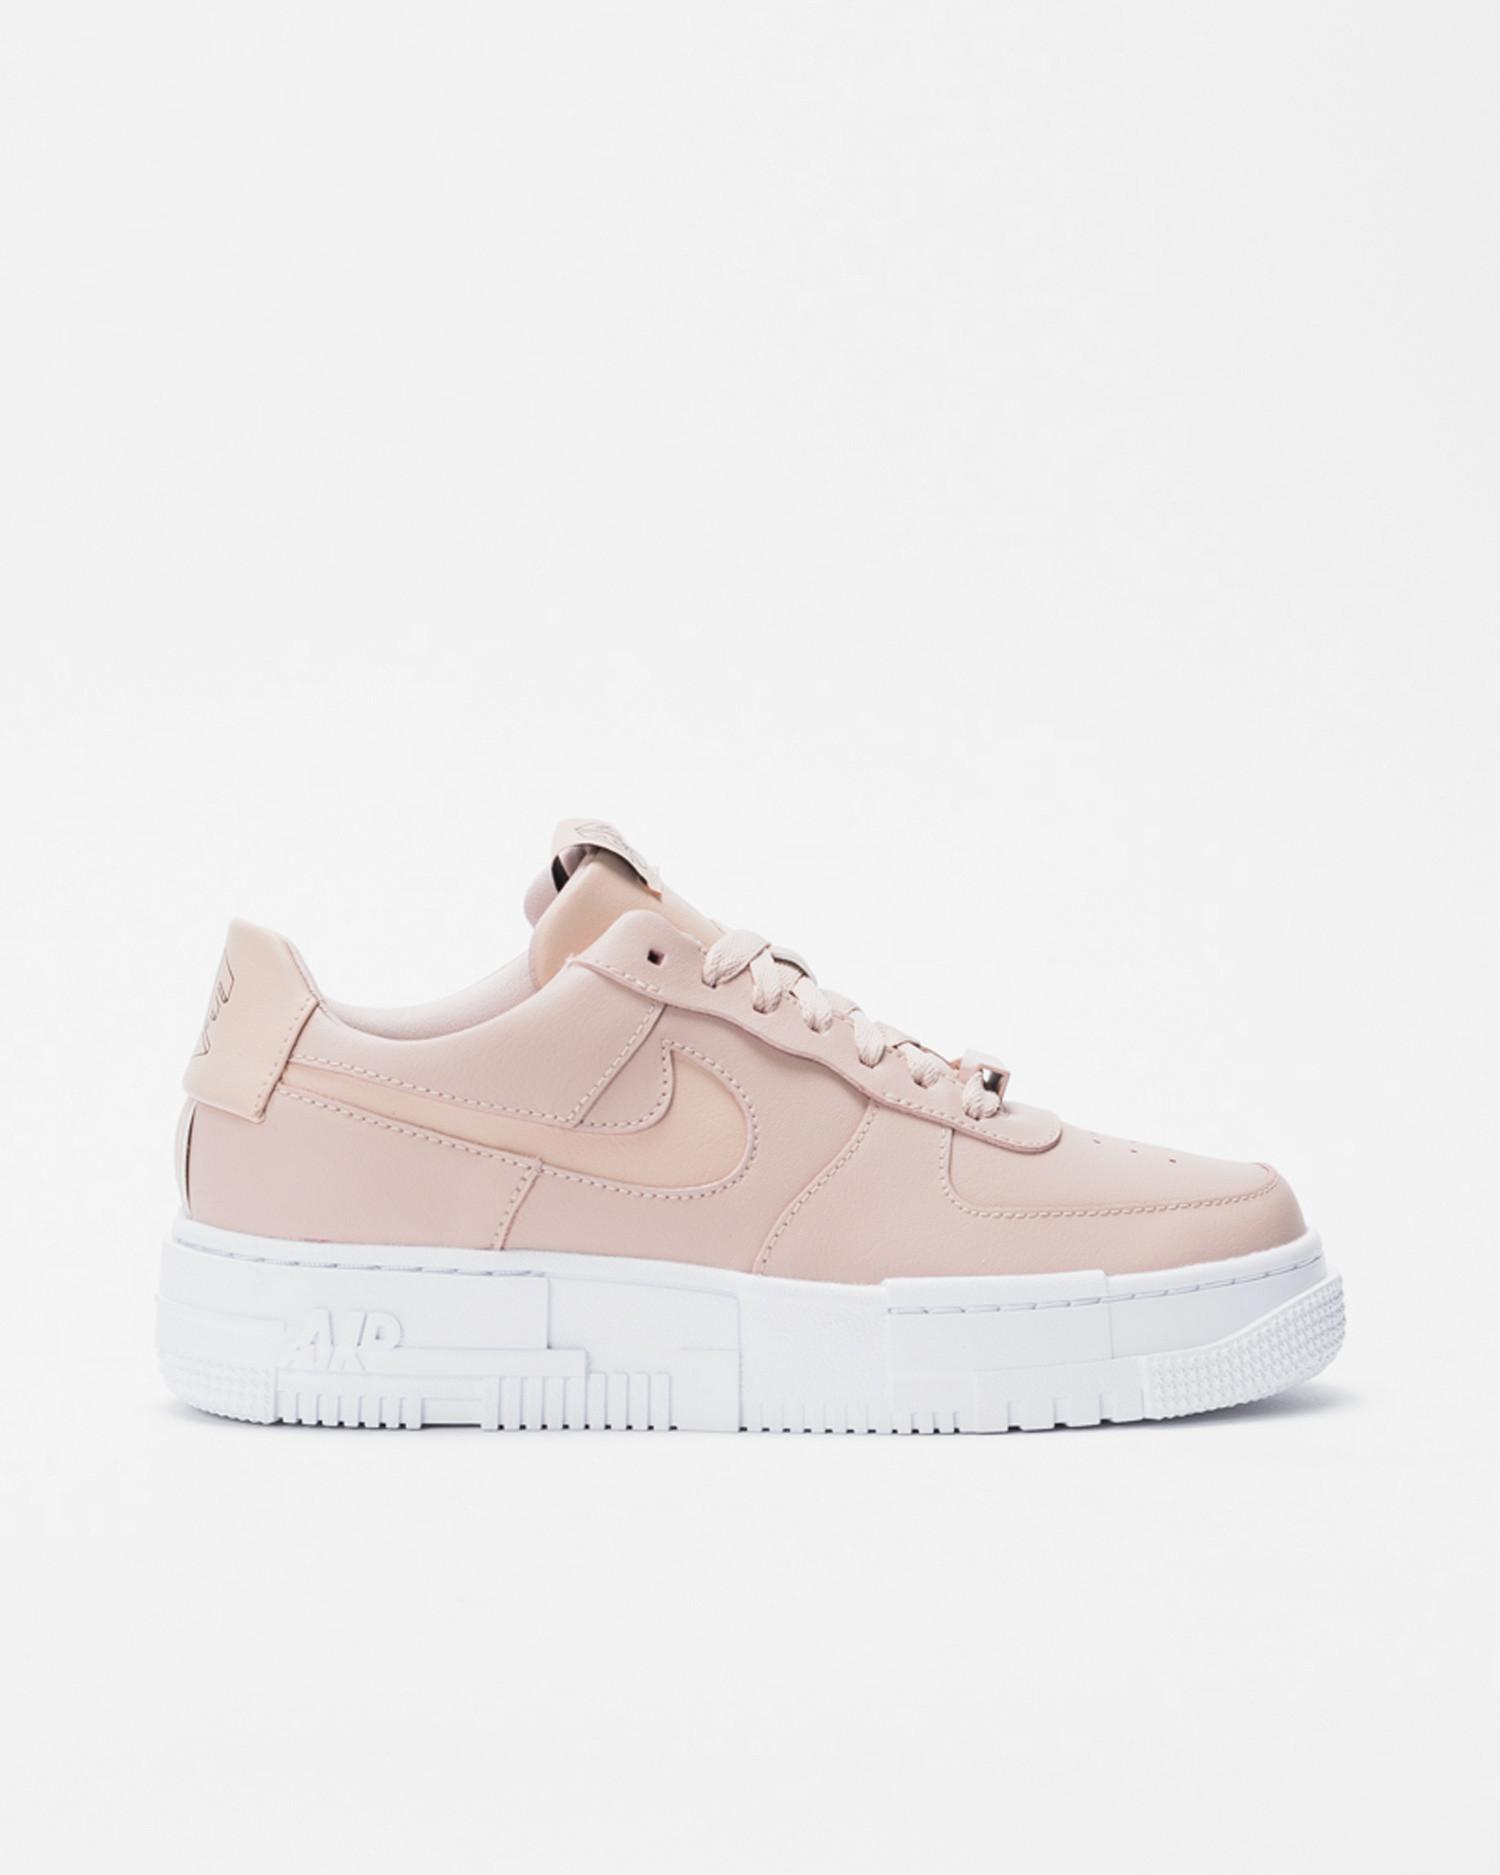 Nike Wmns af1 pixel Particle beige/particle beige-black